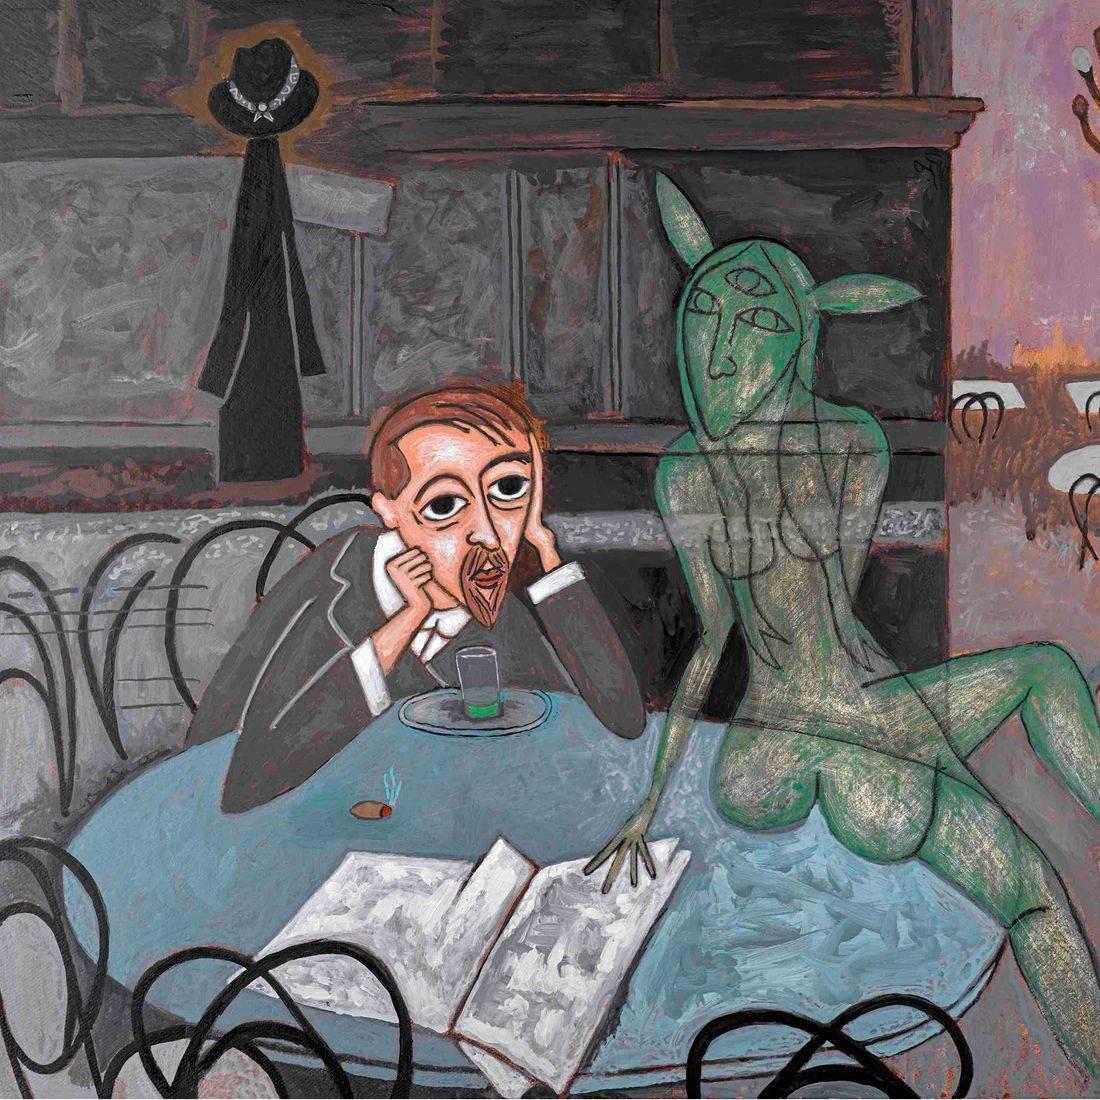 Absinthe Drinker, Viktor Oliva, Michael Andryc, Pop Culture, Pop Art, Contemporary